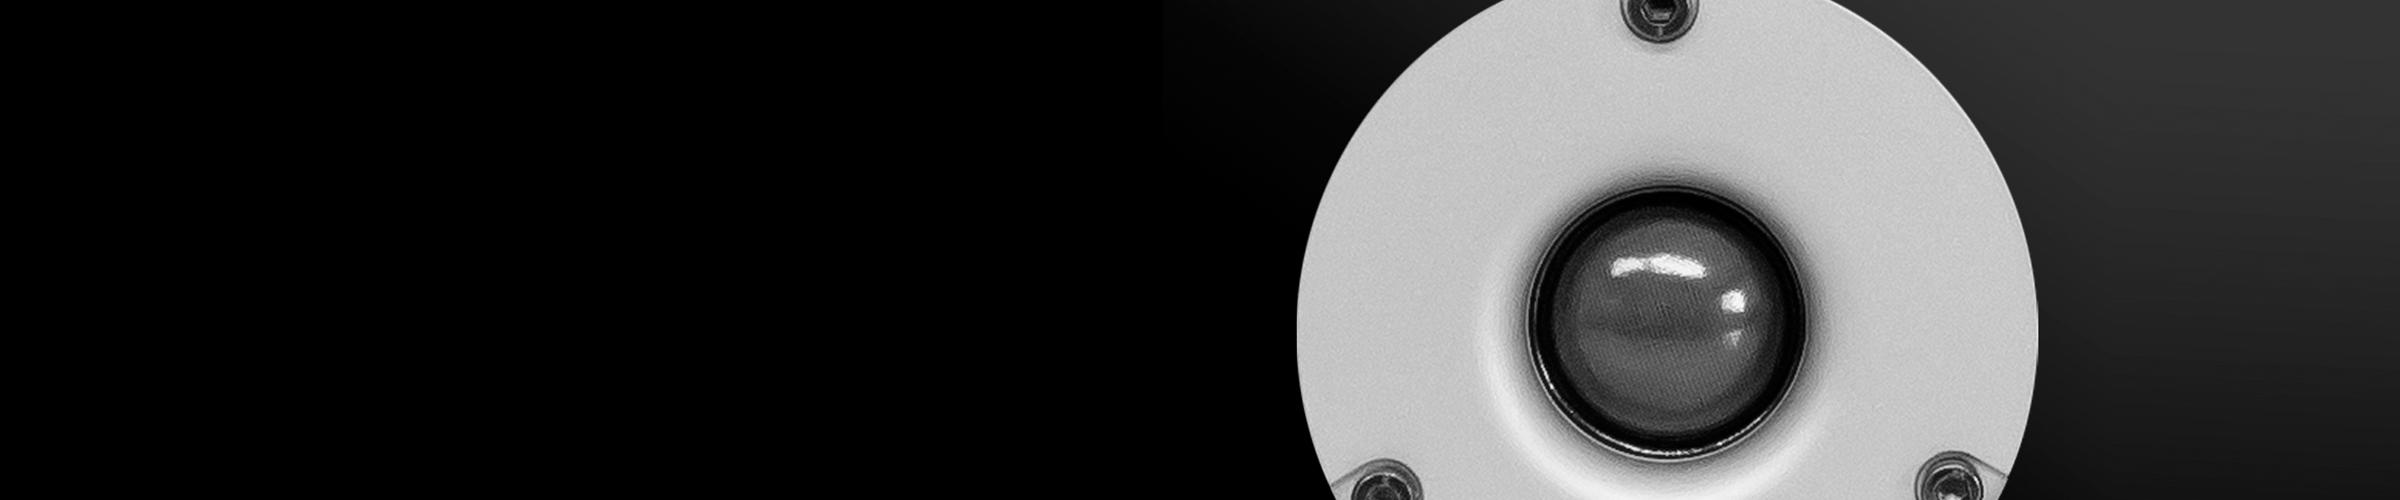 XLBP Bipolar Surround Sound Speakers Tweeters